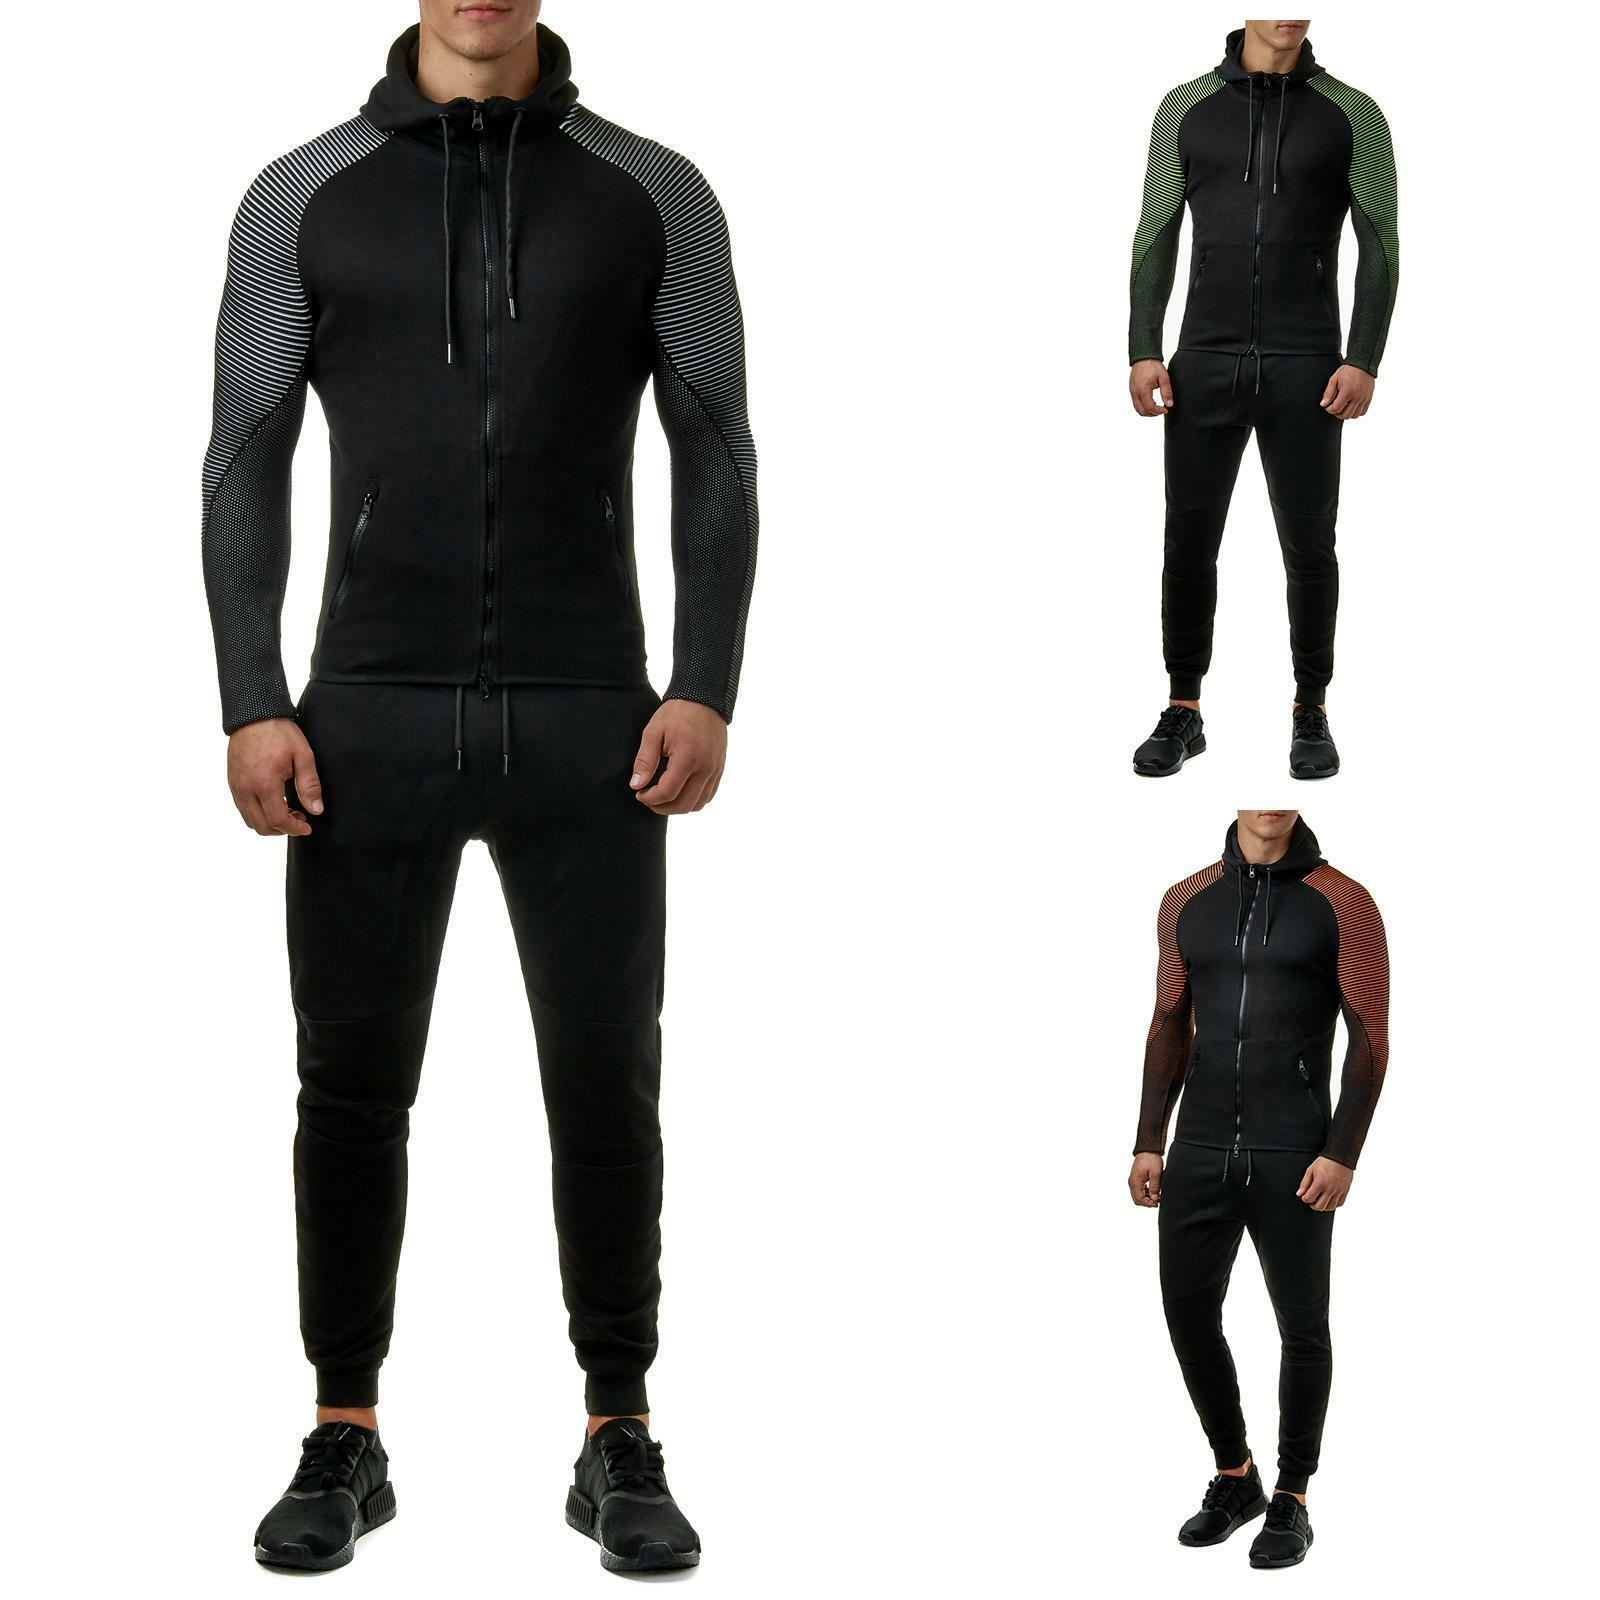 EightyFive EF5018 Herren Jogginganzug Trainingsanzug Jogging Hose Fitness S-XL    | Vielfältiges neues Design